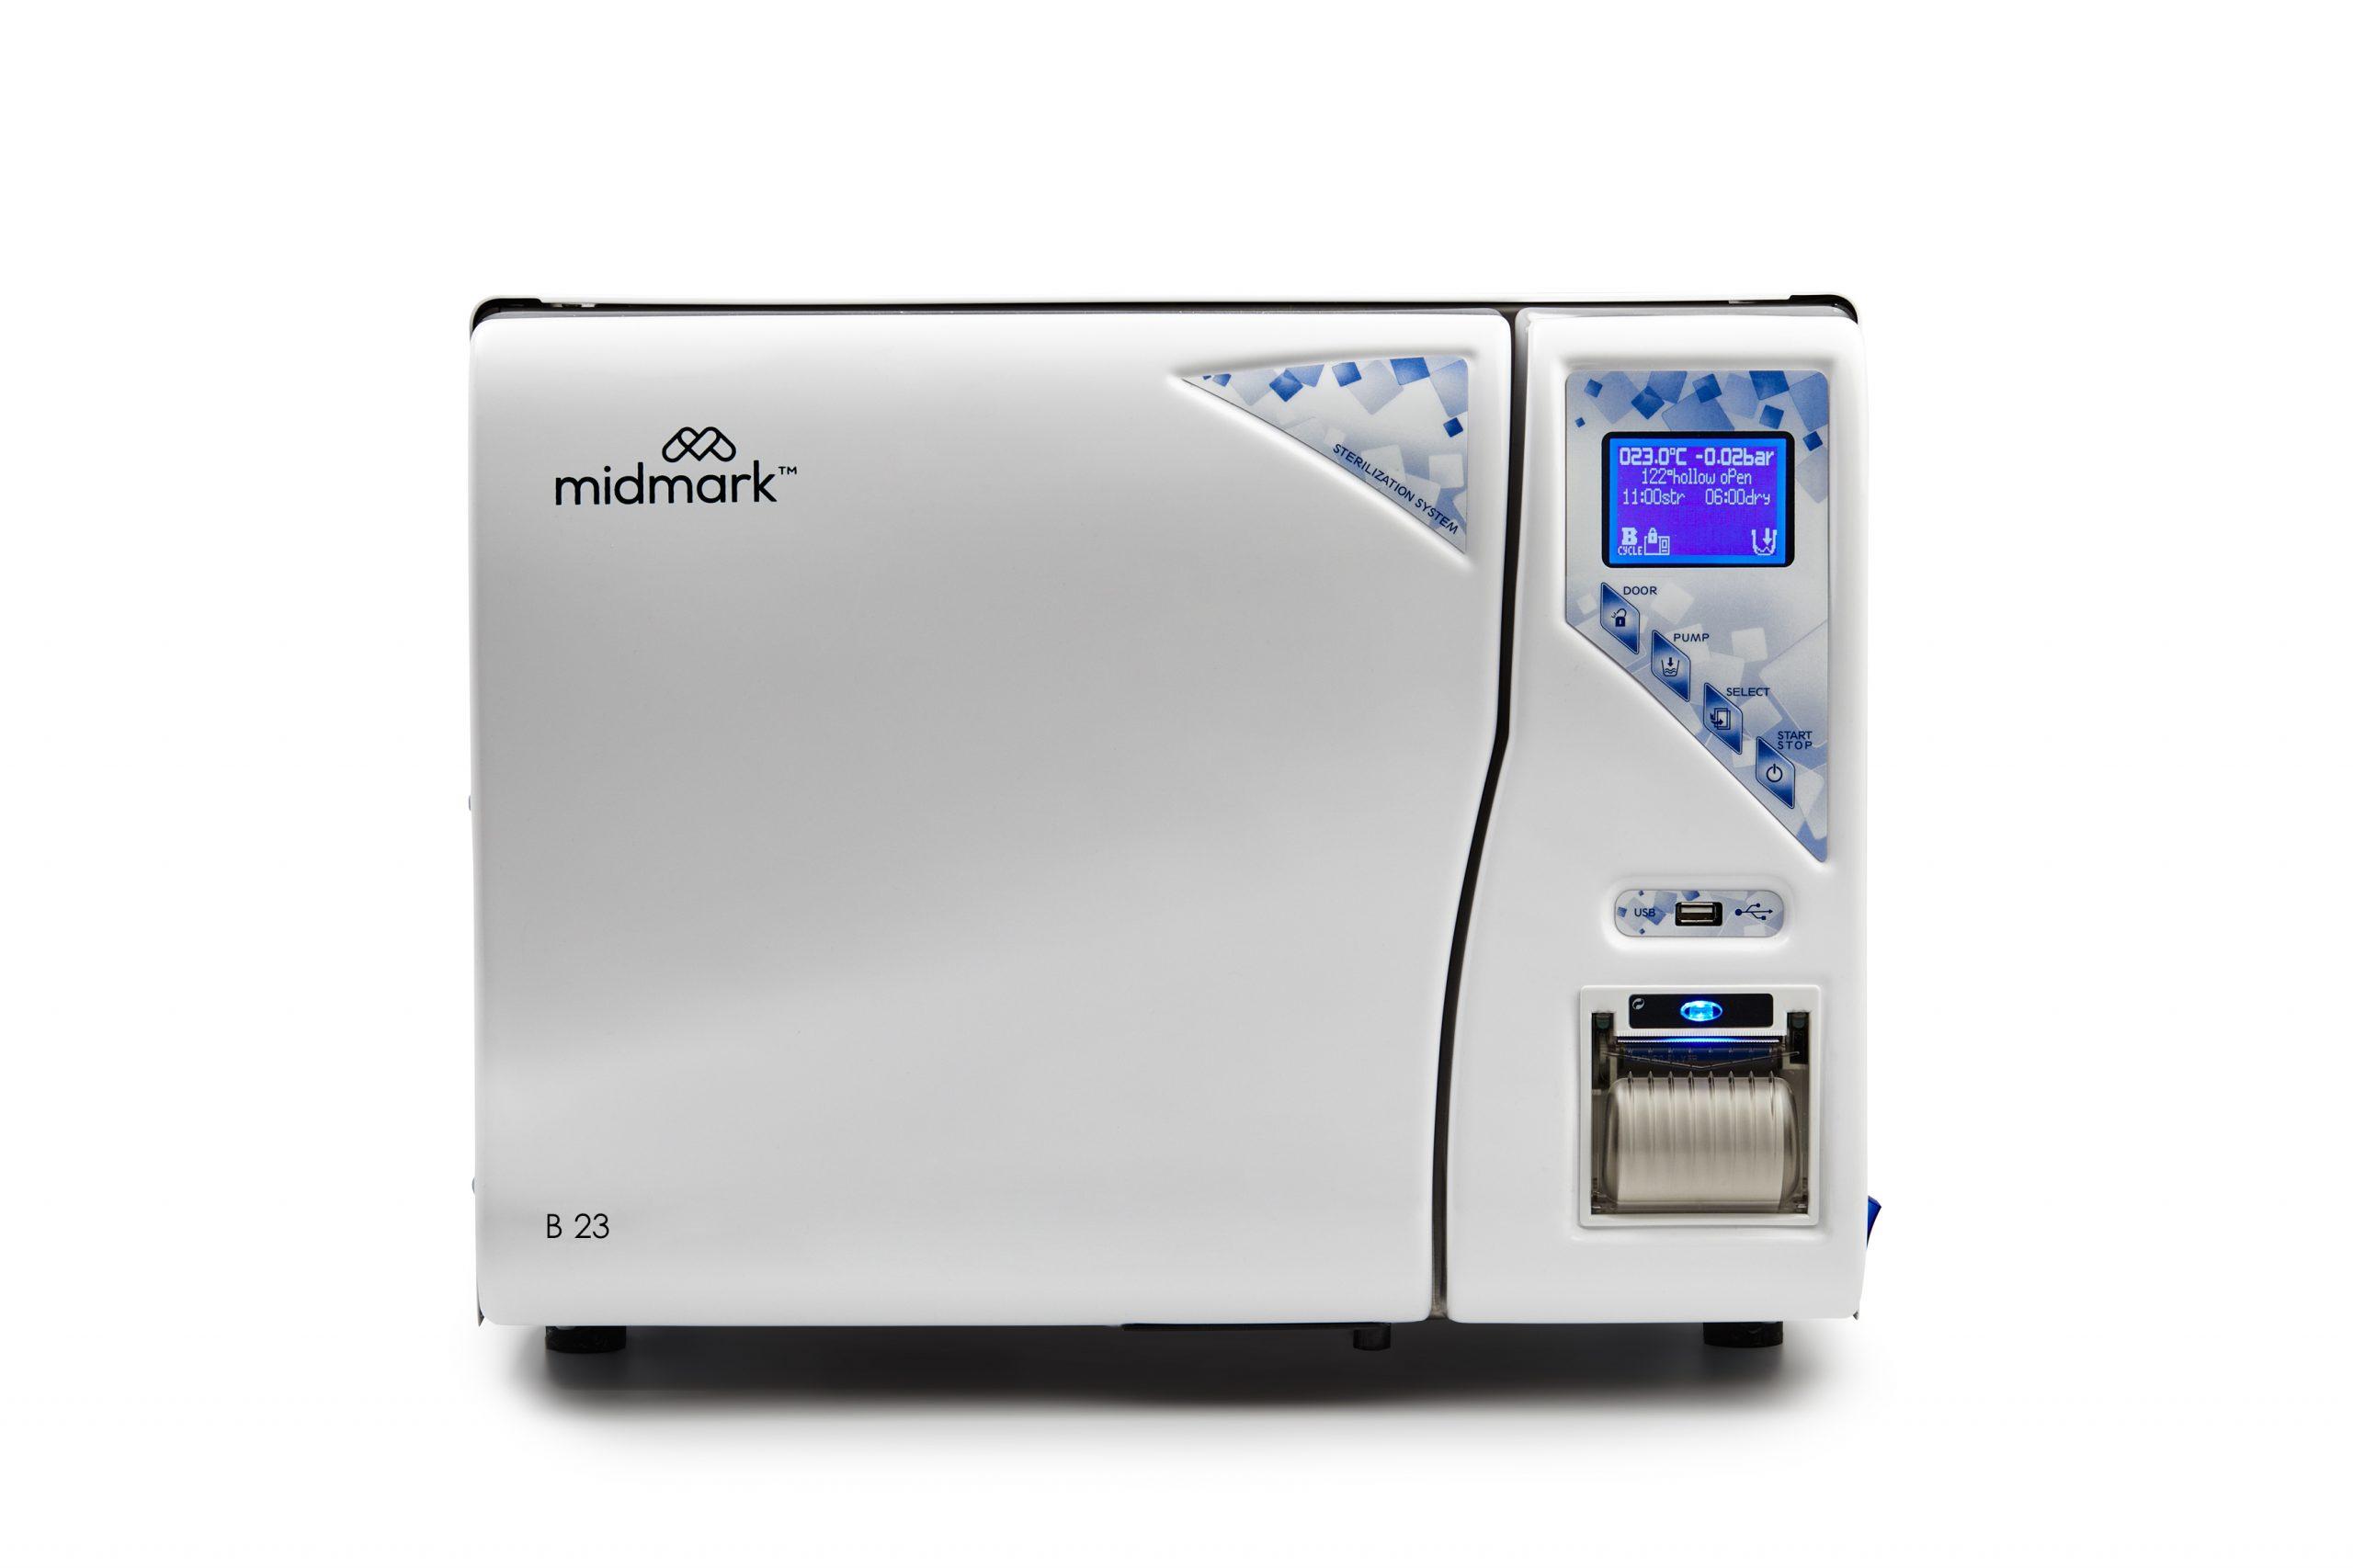 Sterilizatorius Midmark B23